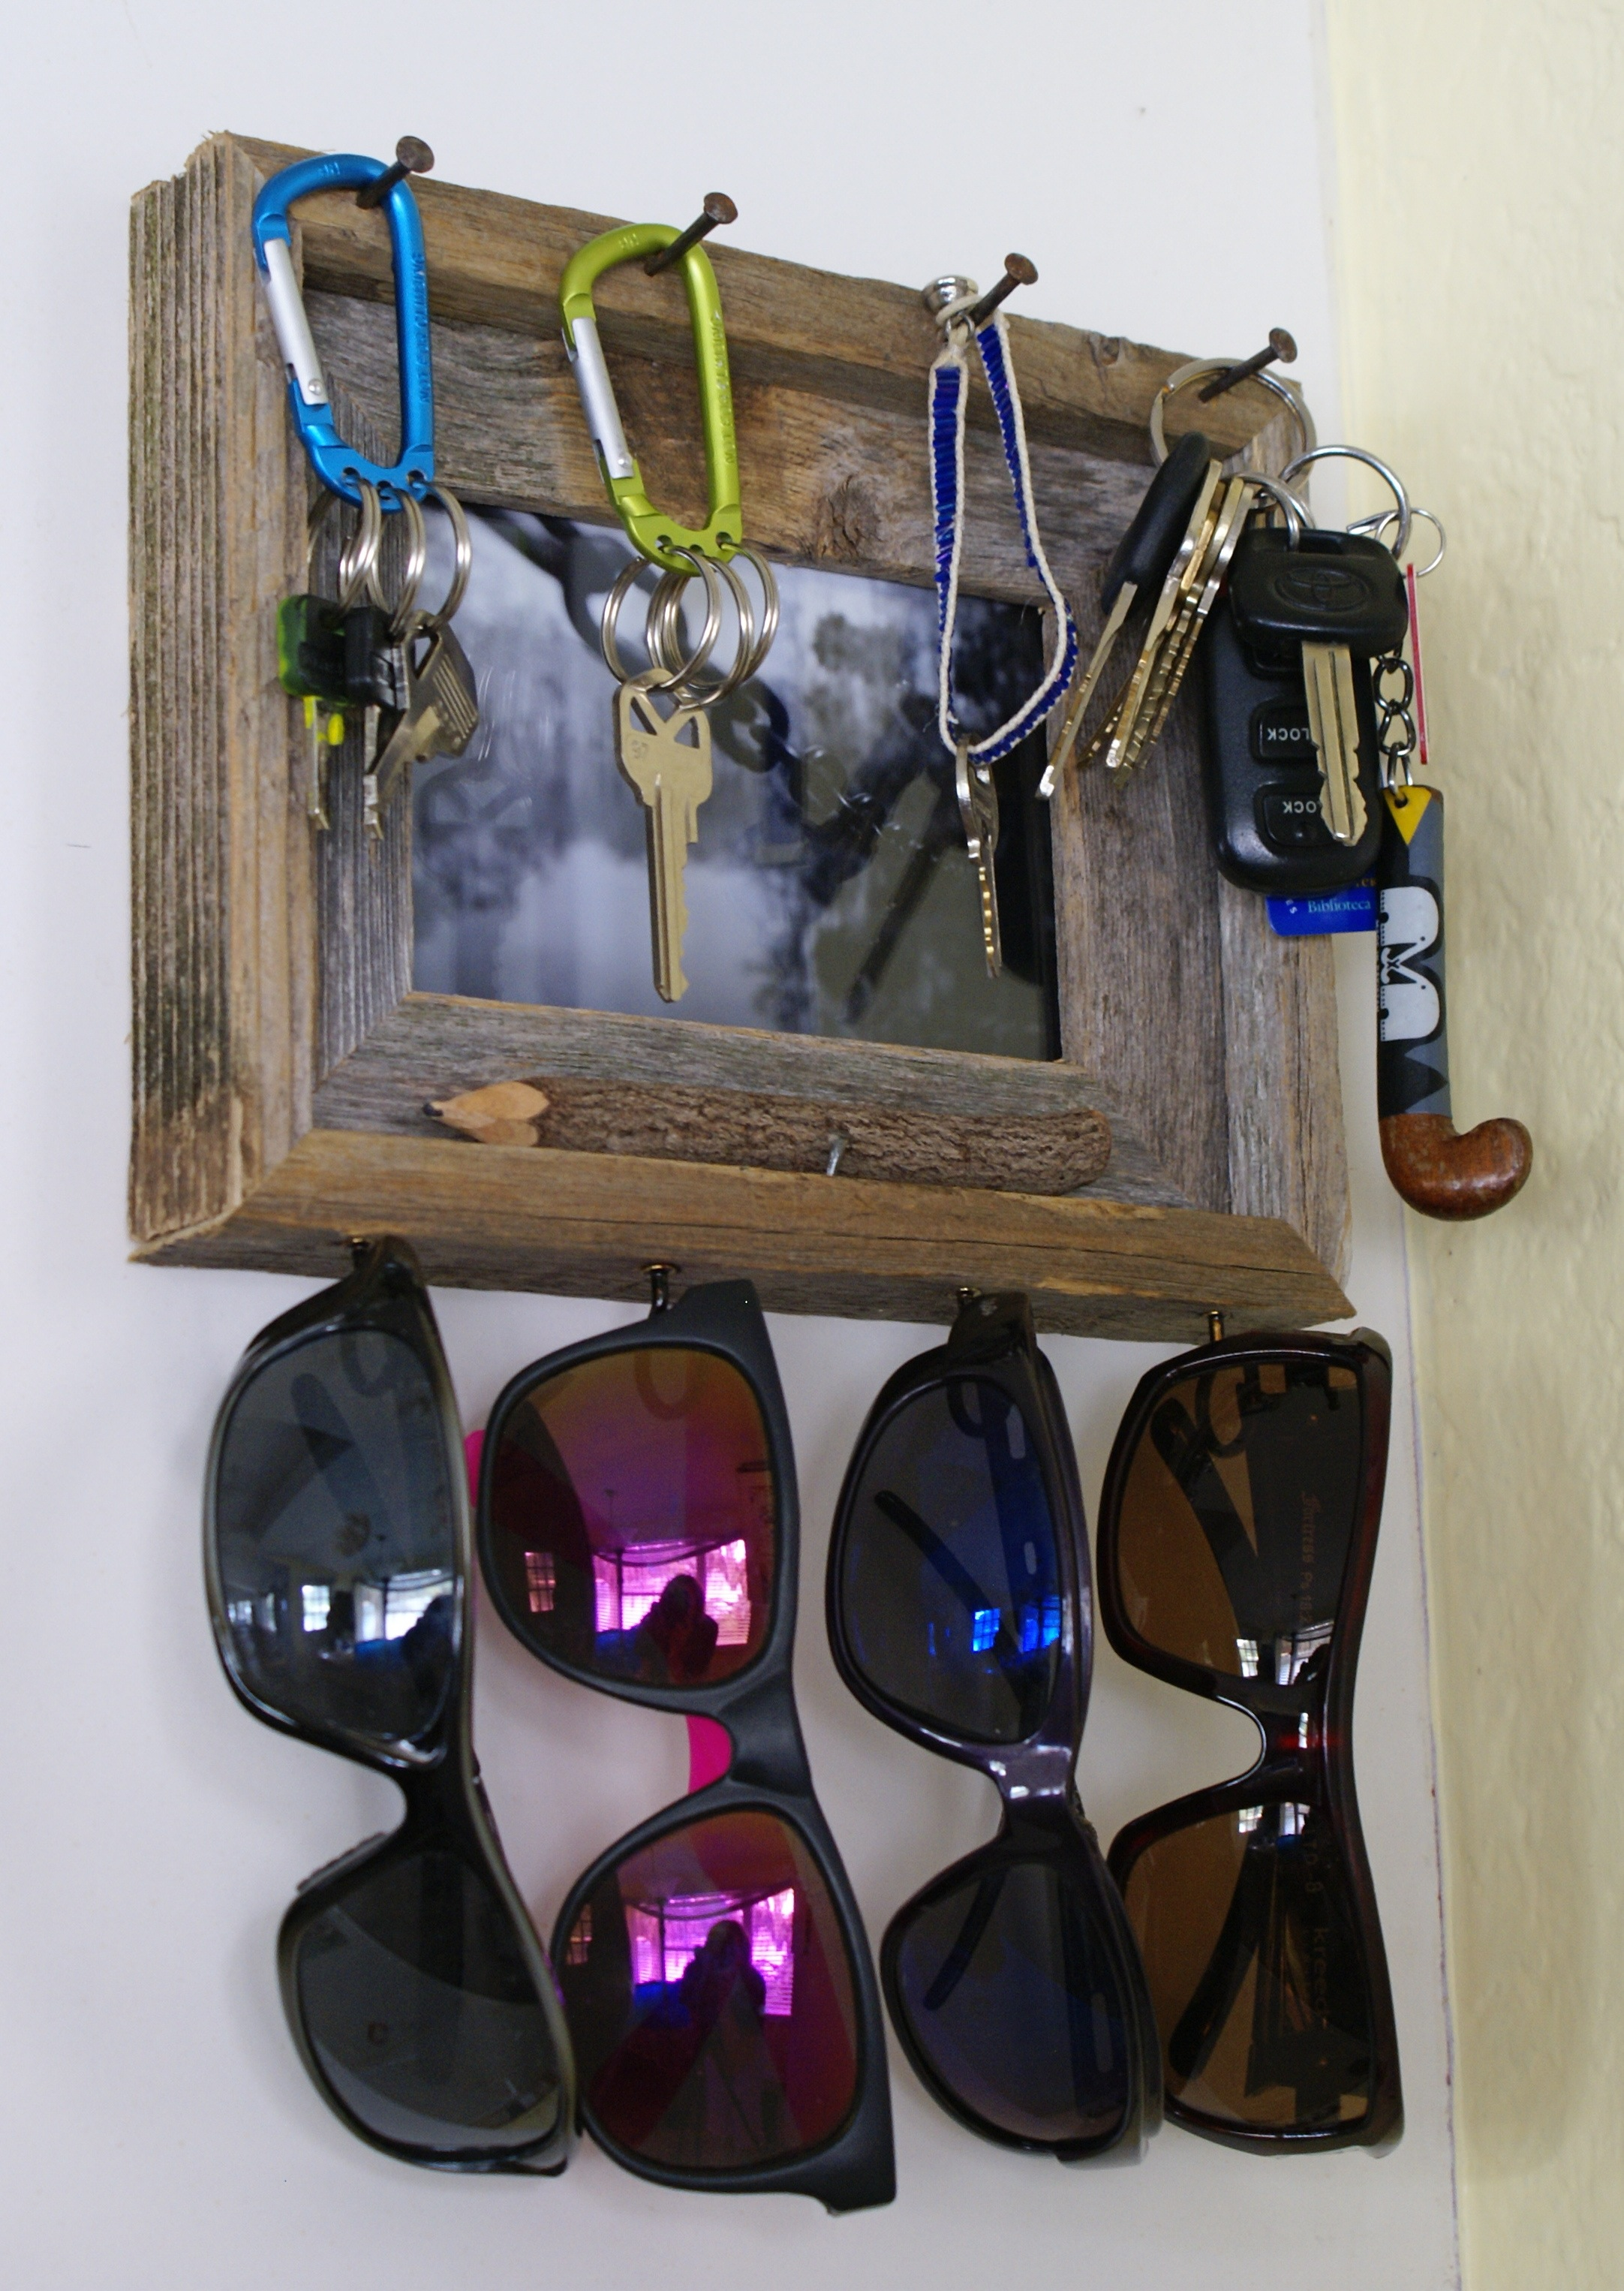 Rustic Key & Sunglasses Holder via The Thinking Closet